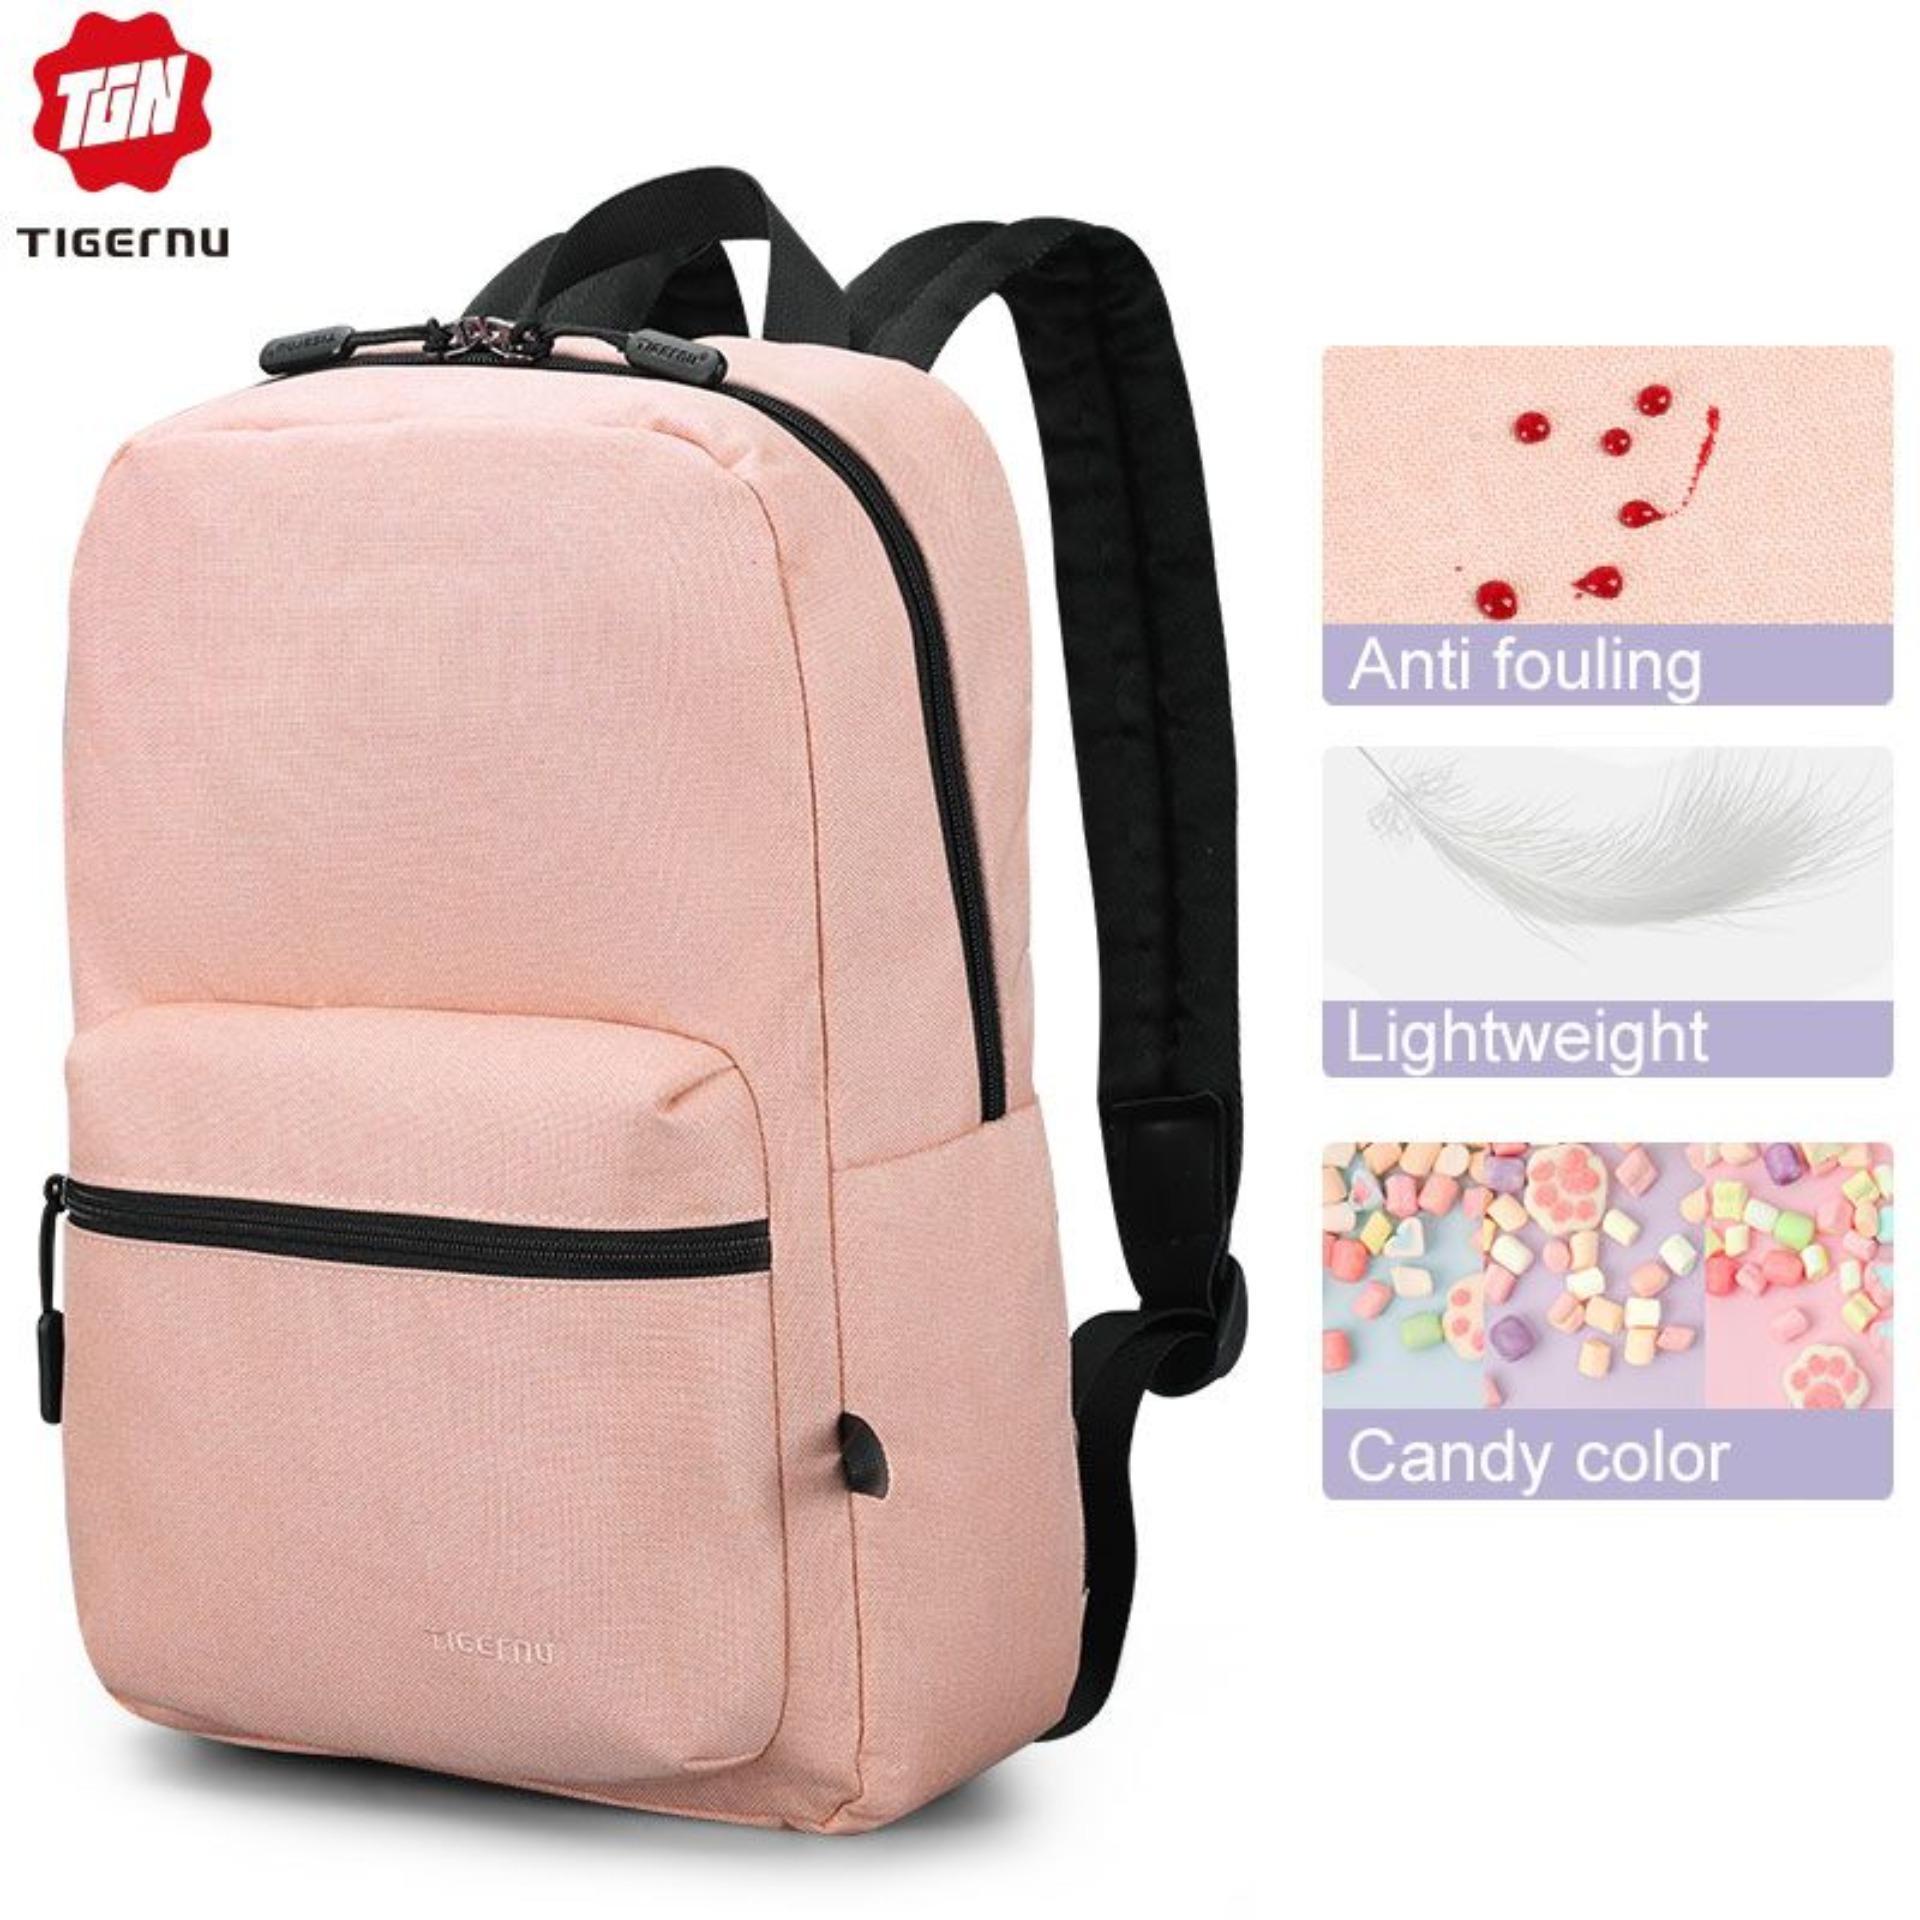 Tigernu New Anti fouling College School Backpacks Fit for 14 inch laptop Fashion bag women School bag for Girls